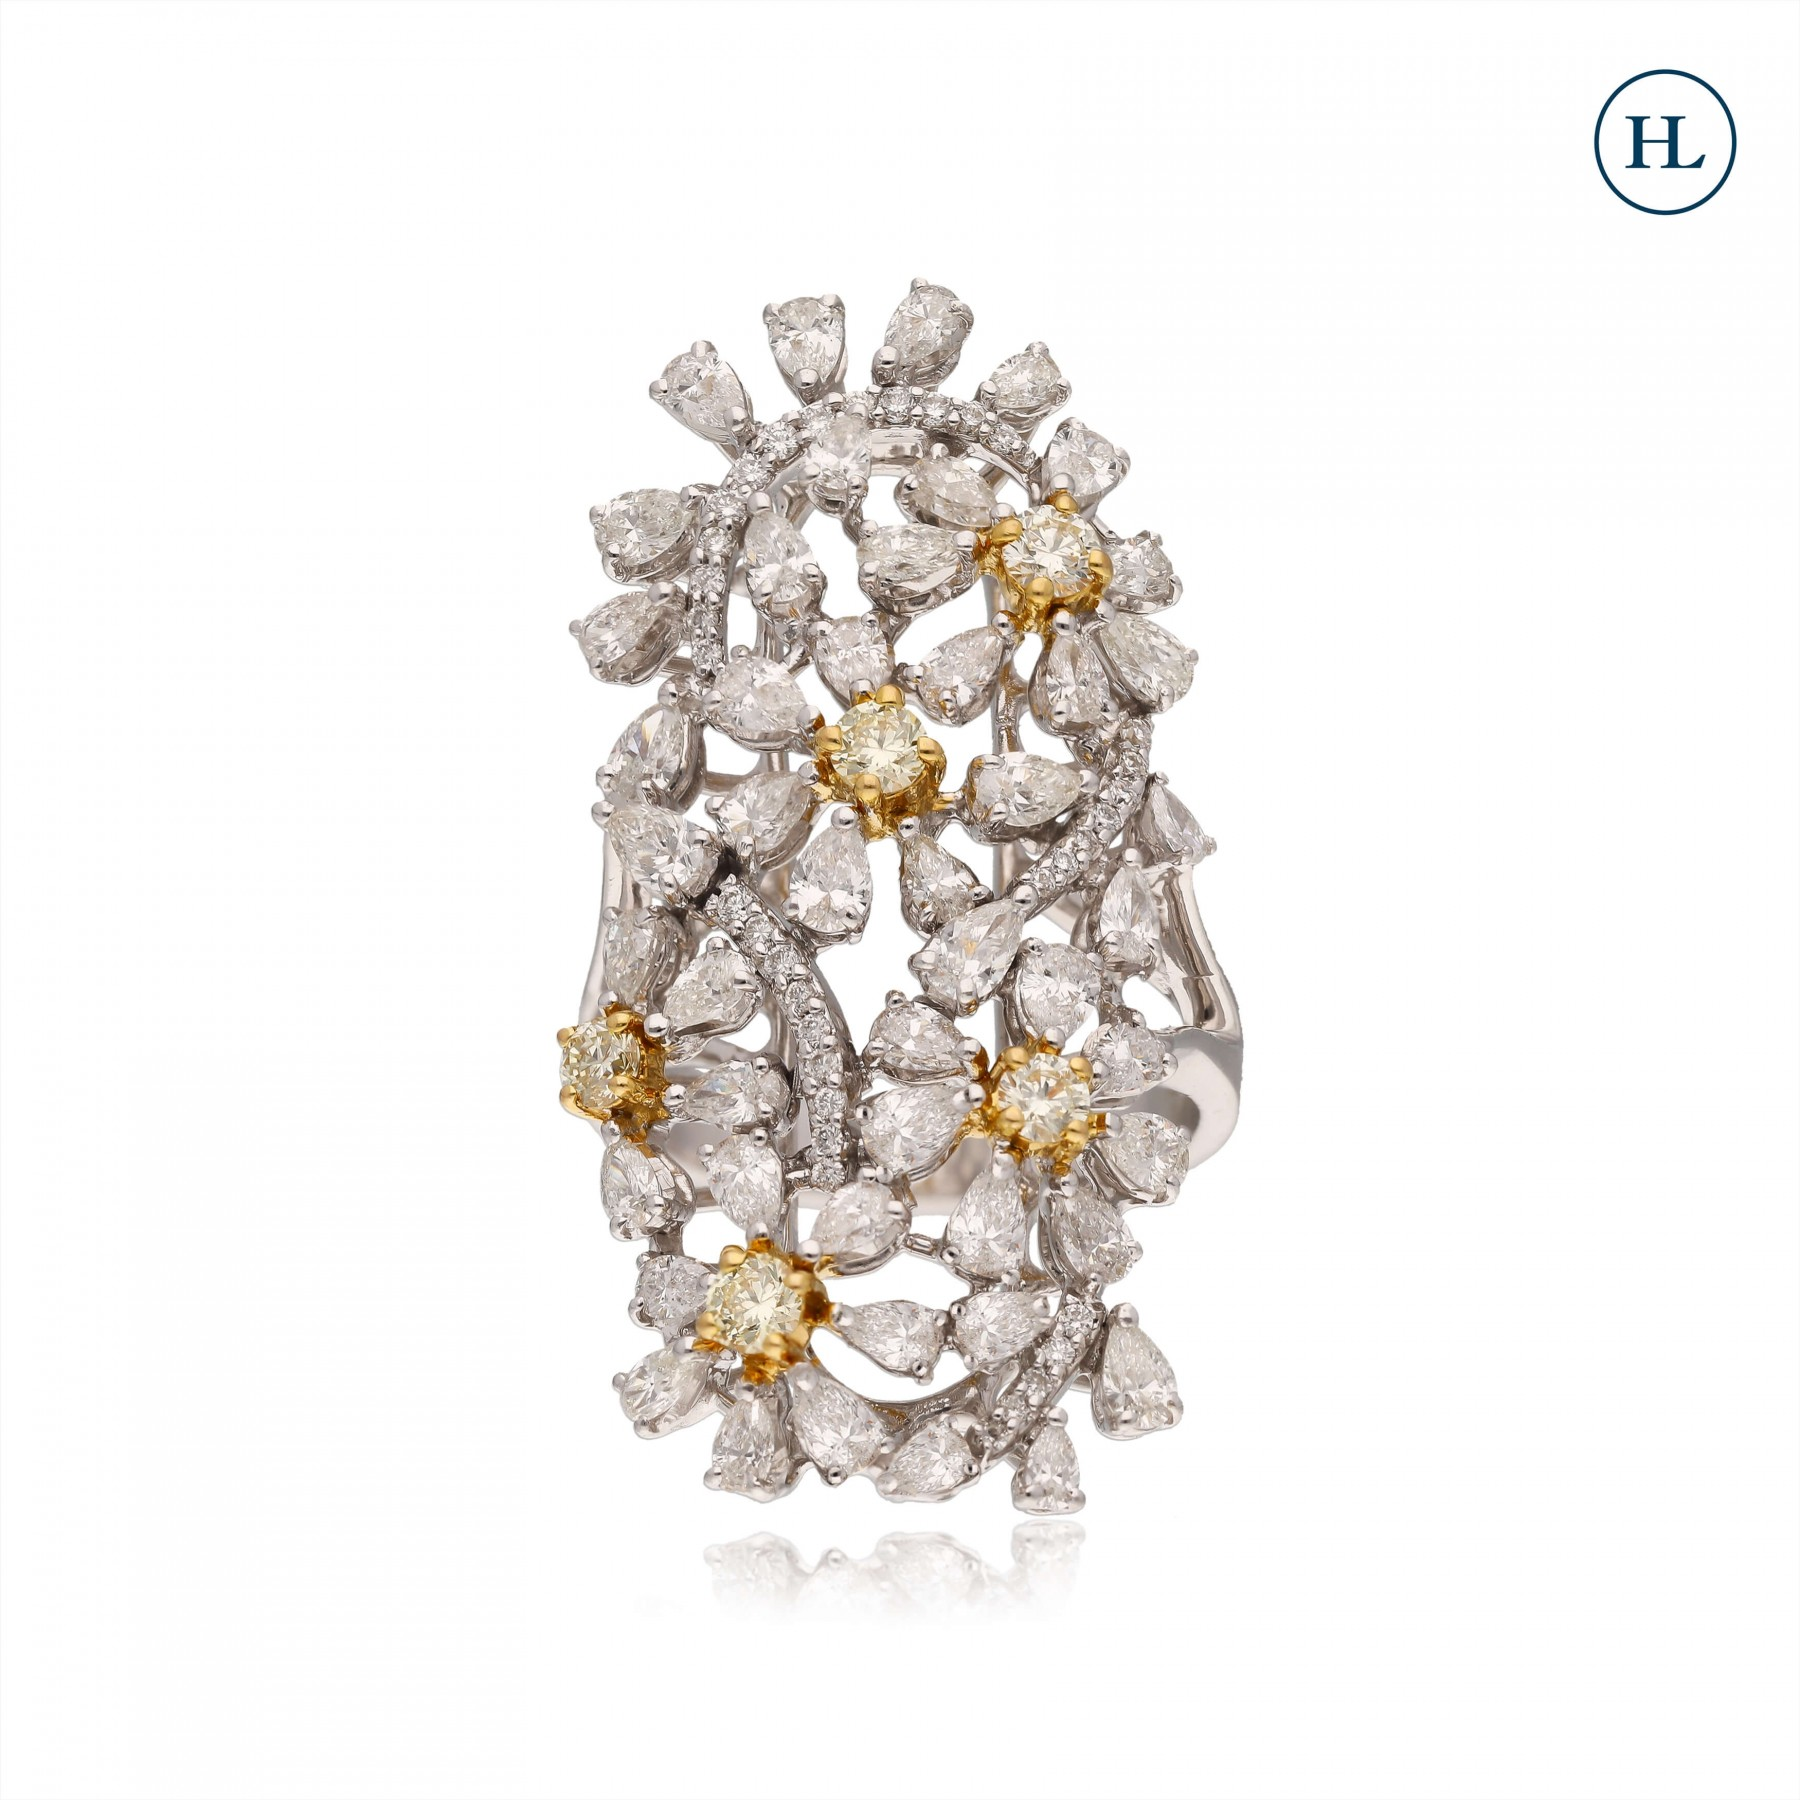 Dual Tone Diamond Ring